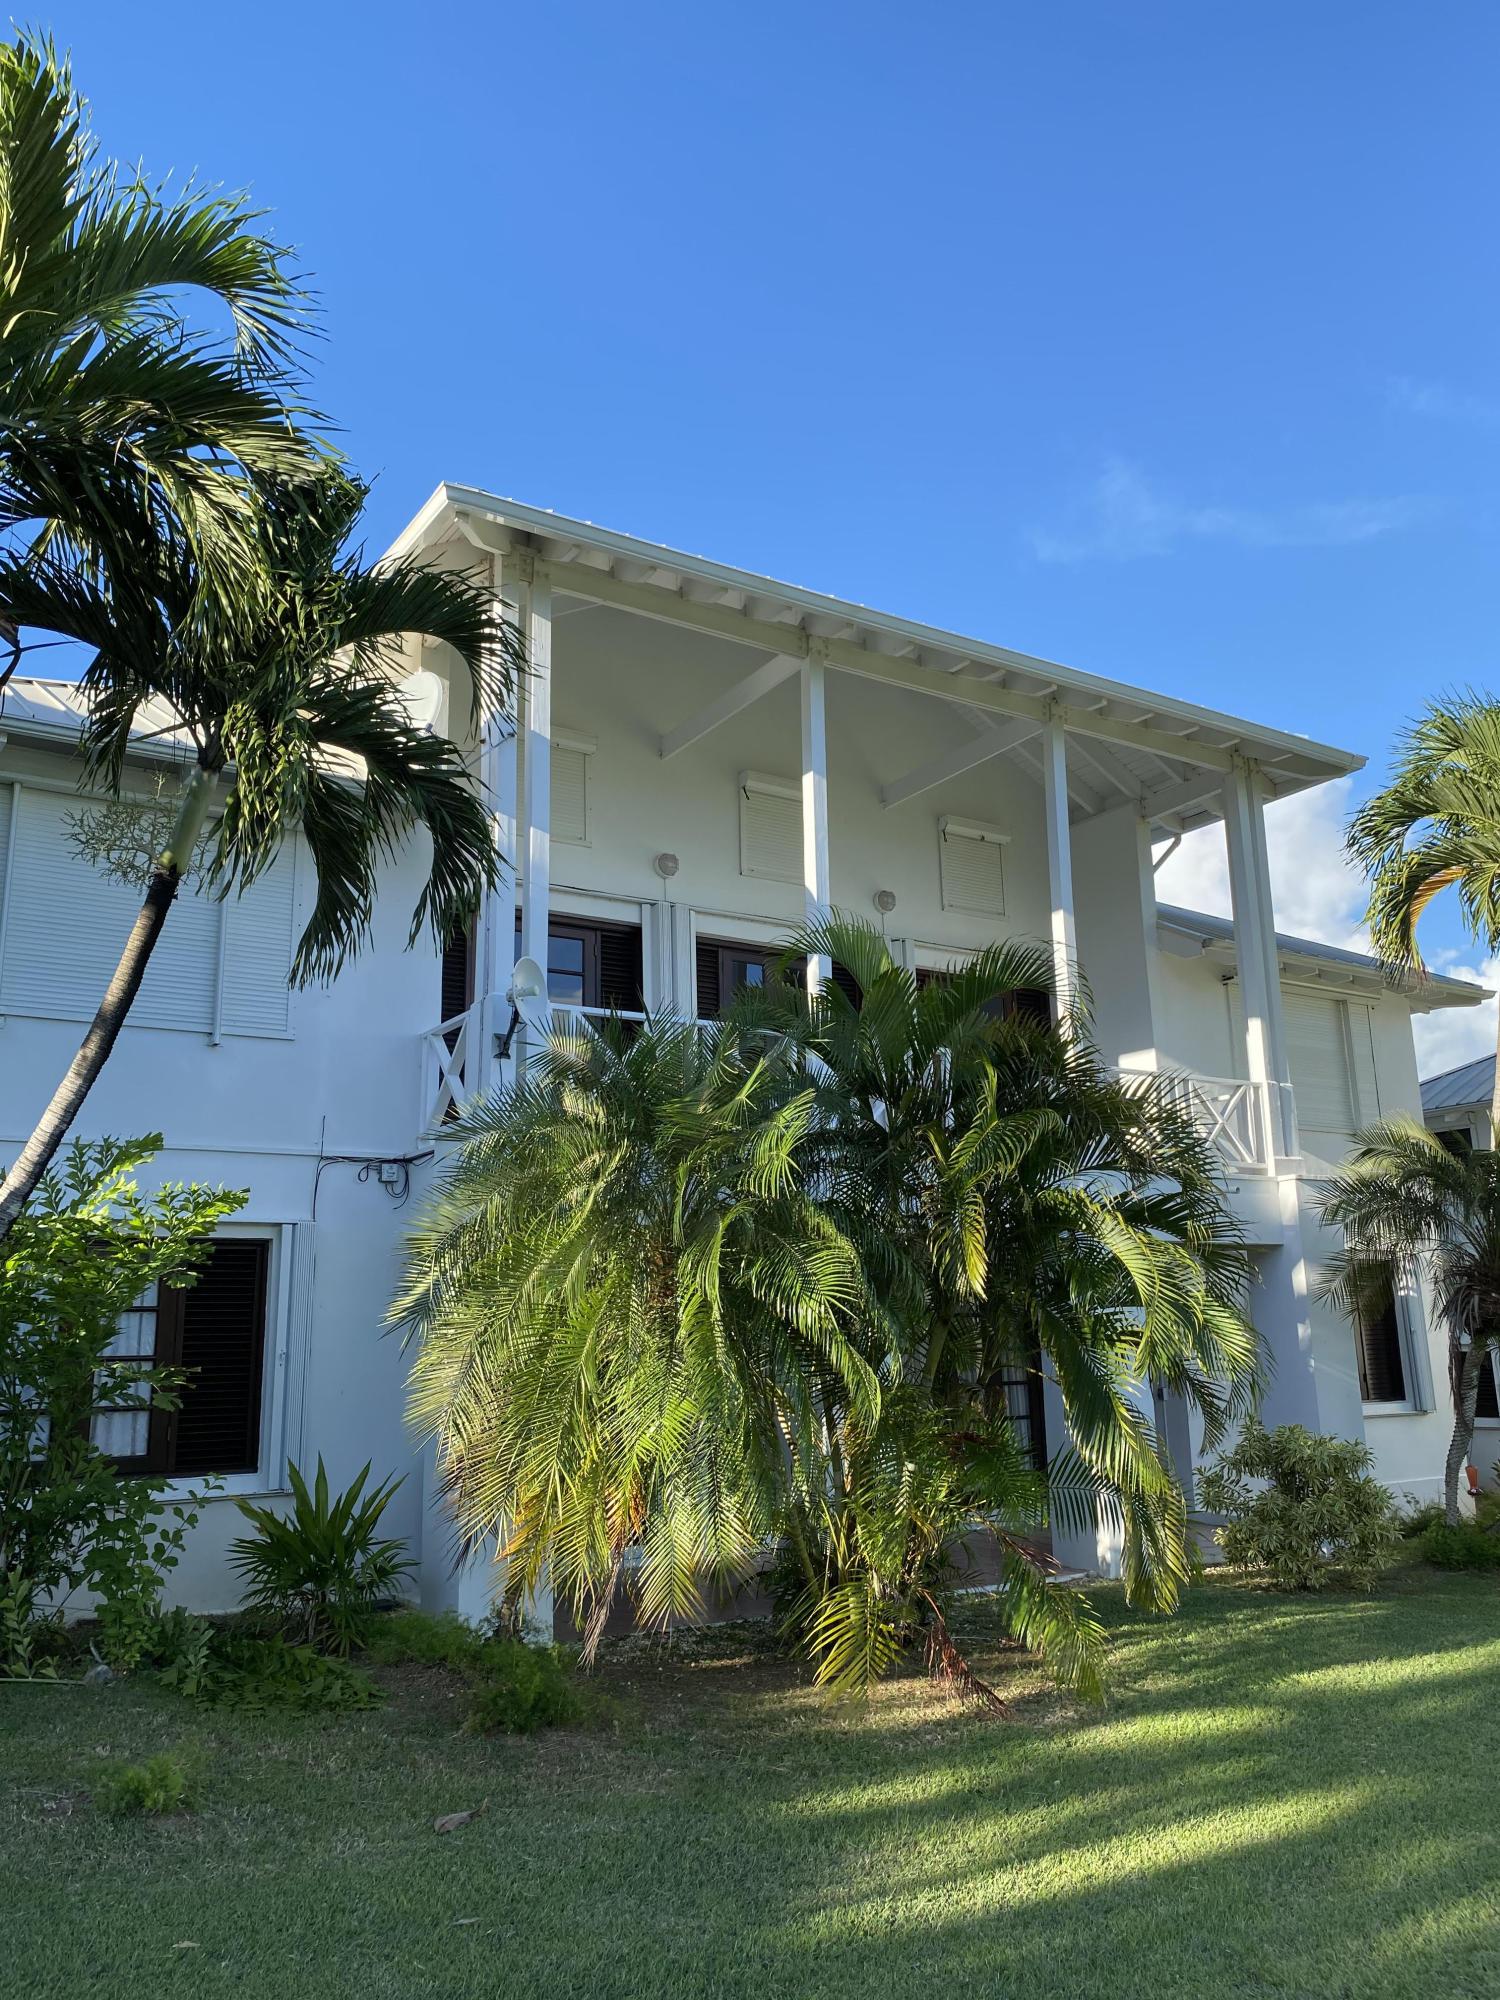 RE/MAX real estate, US Virgin Islands, River Estate, New Listing  Condominiums  River PR